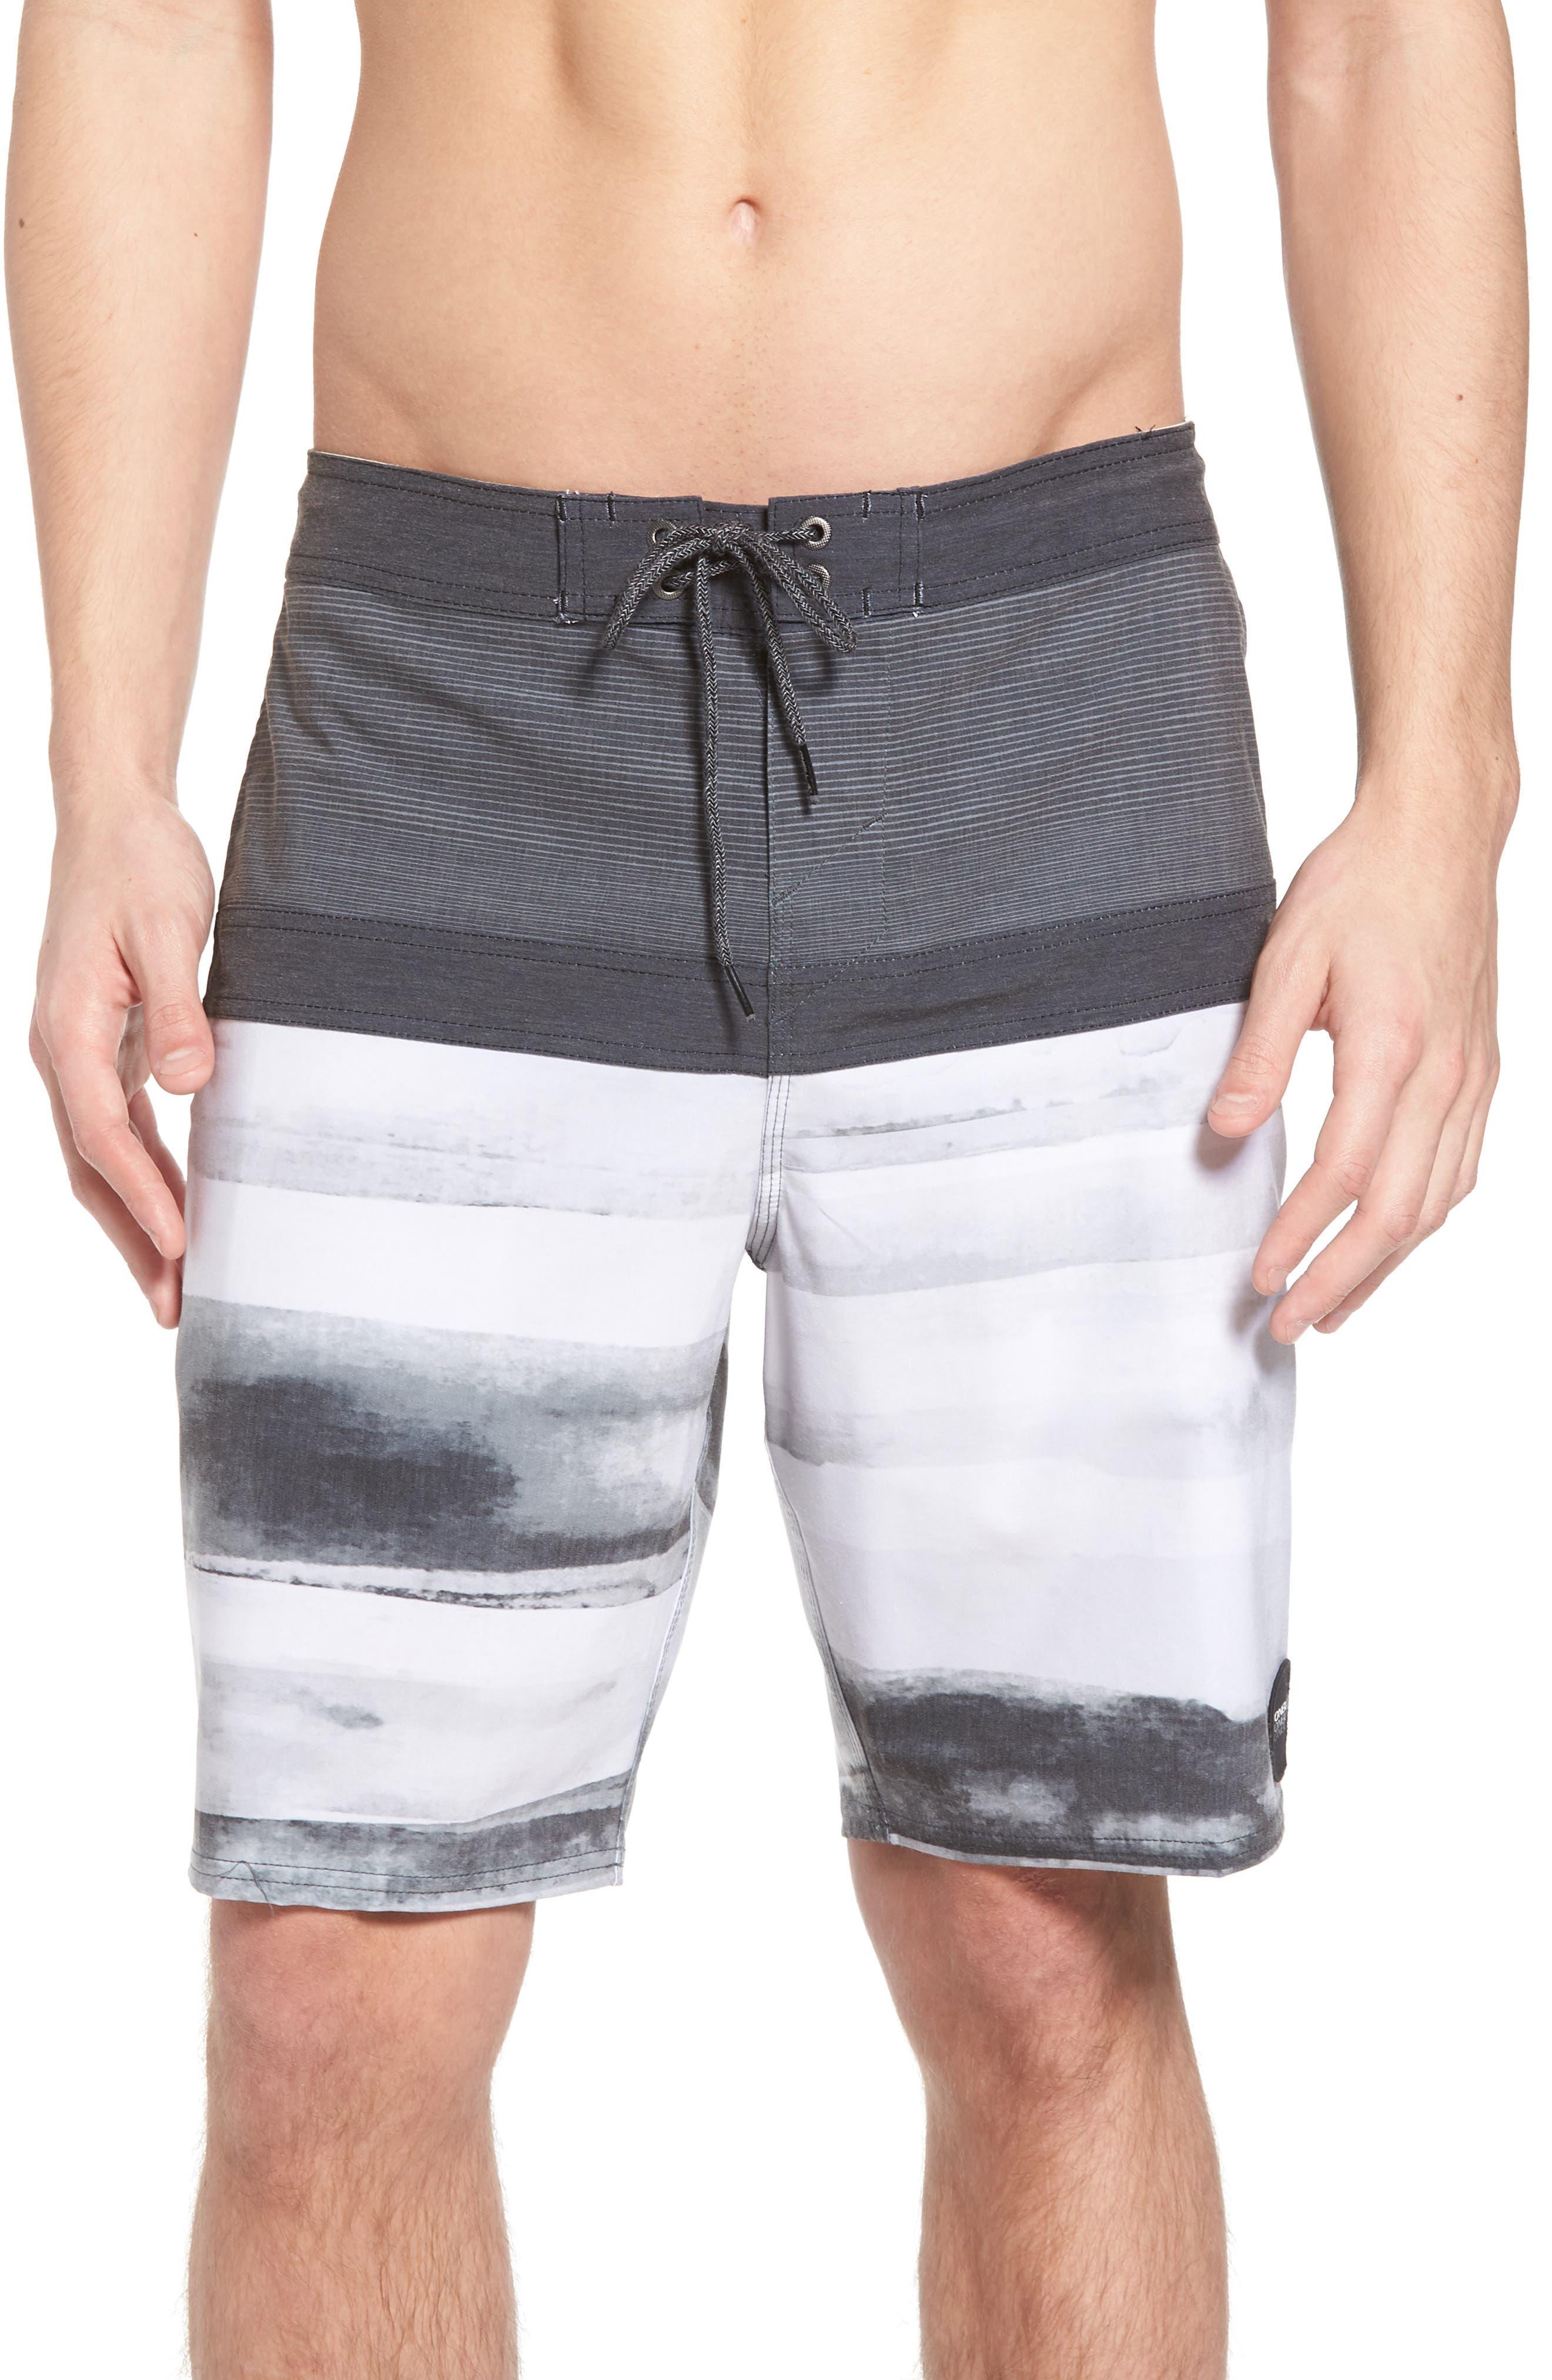 Breaker Cruzer Board Shorts,                         Main,                         color, Black